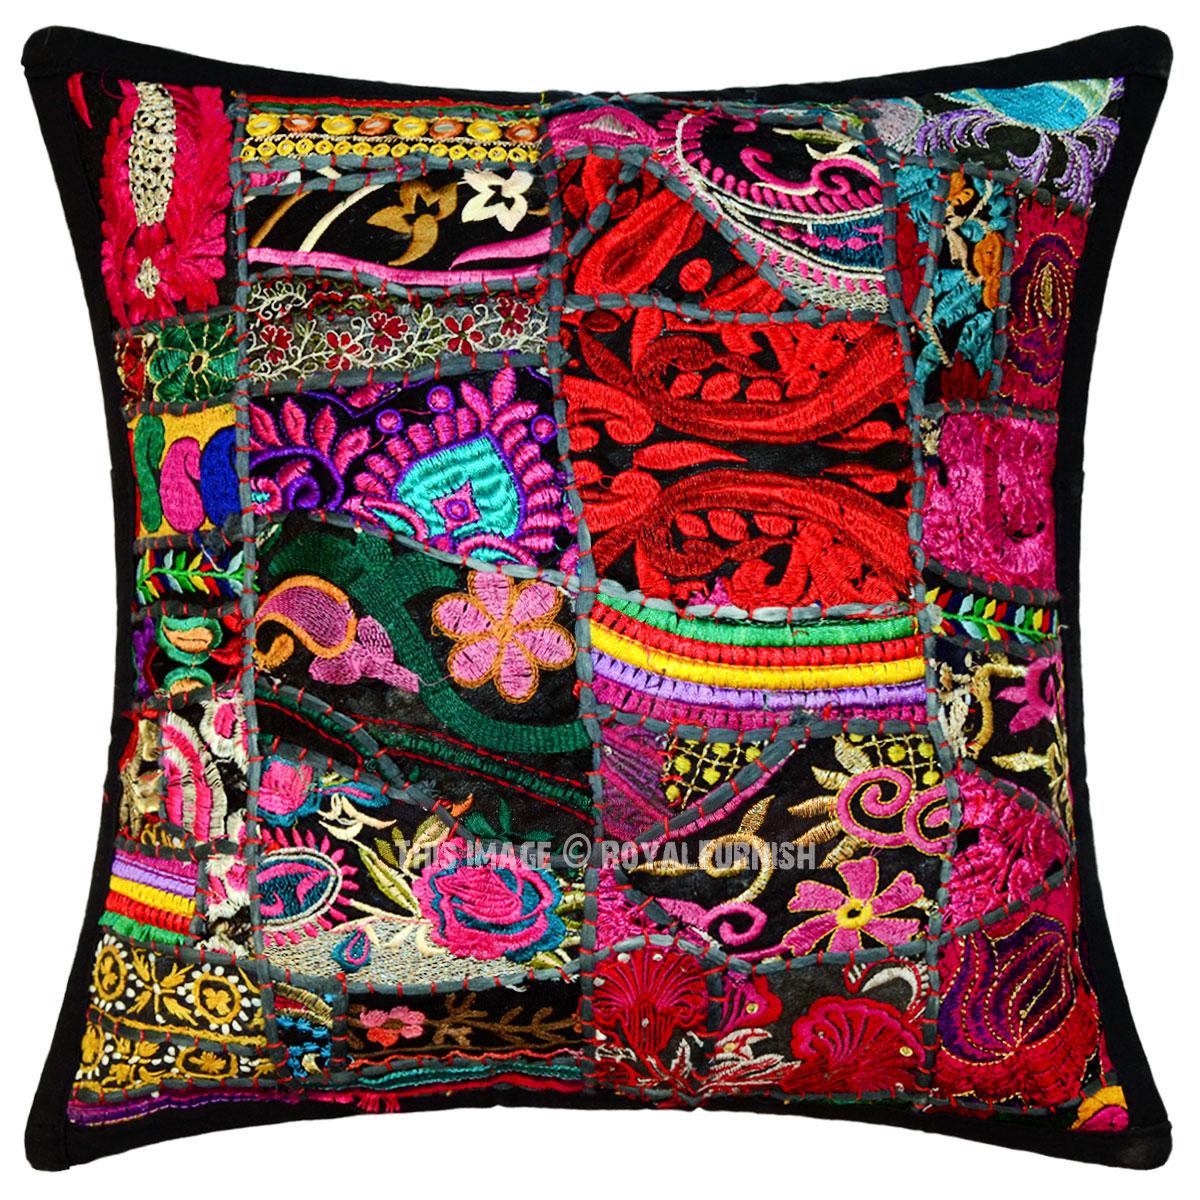 Black Outdoor/Indoor Bohemian Patchwork Throw Pillow Cover 16X16 - RoyalFurnish.com